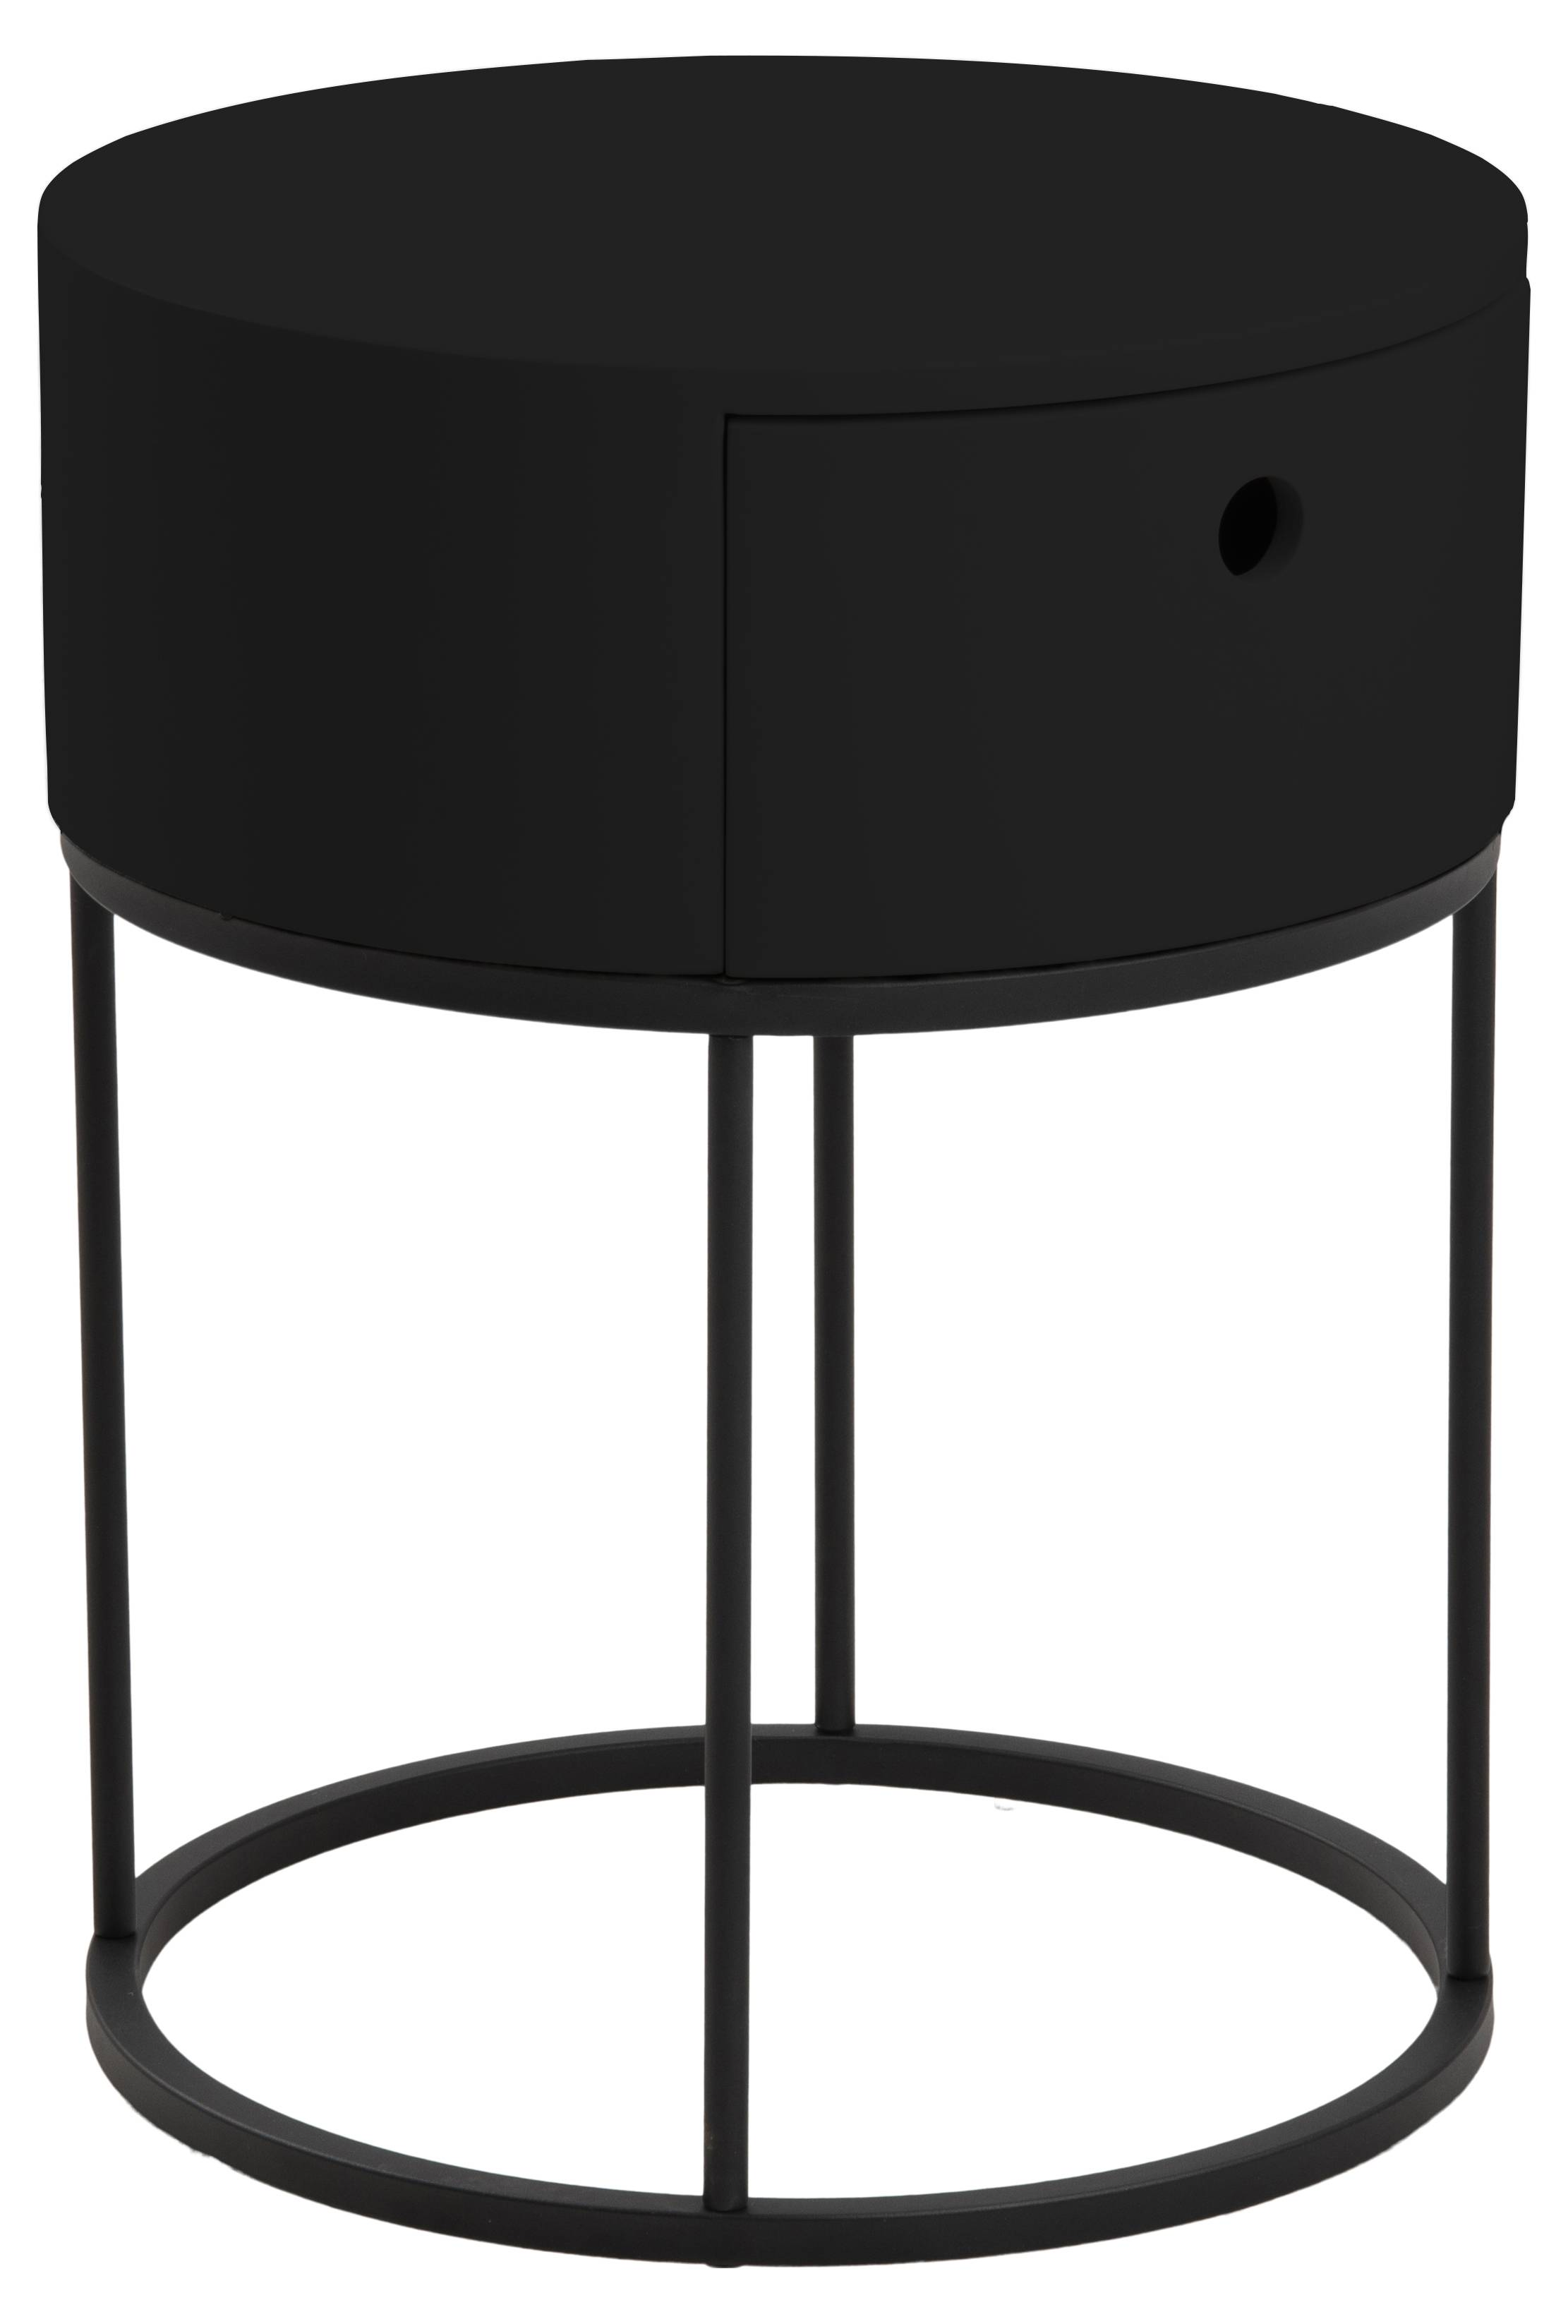 Polo natbord 1 skuffe, Ø40 cm sort.